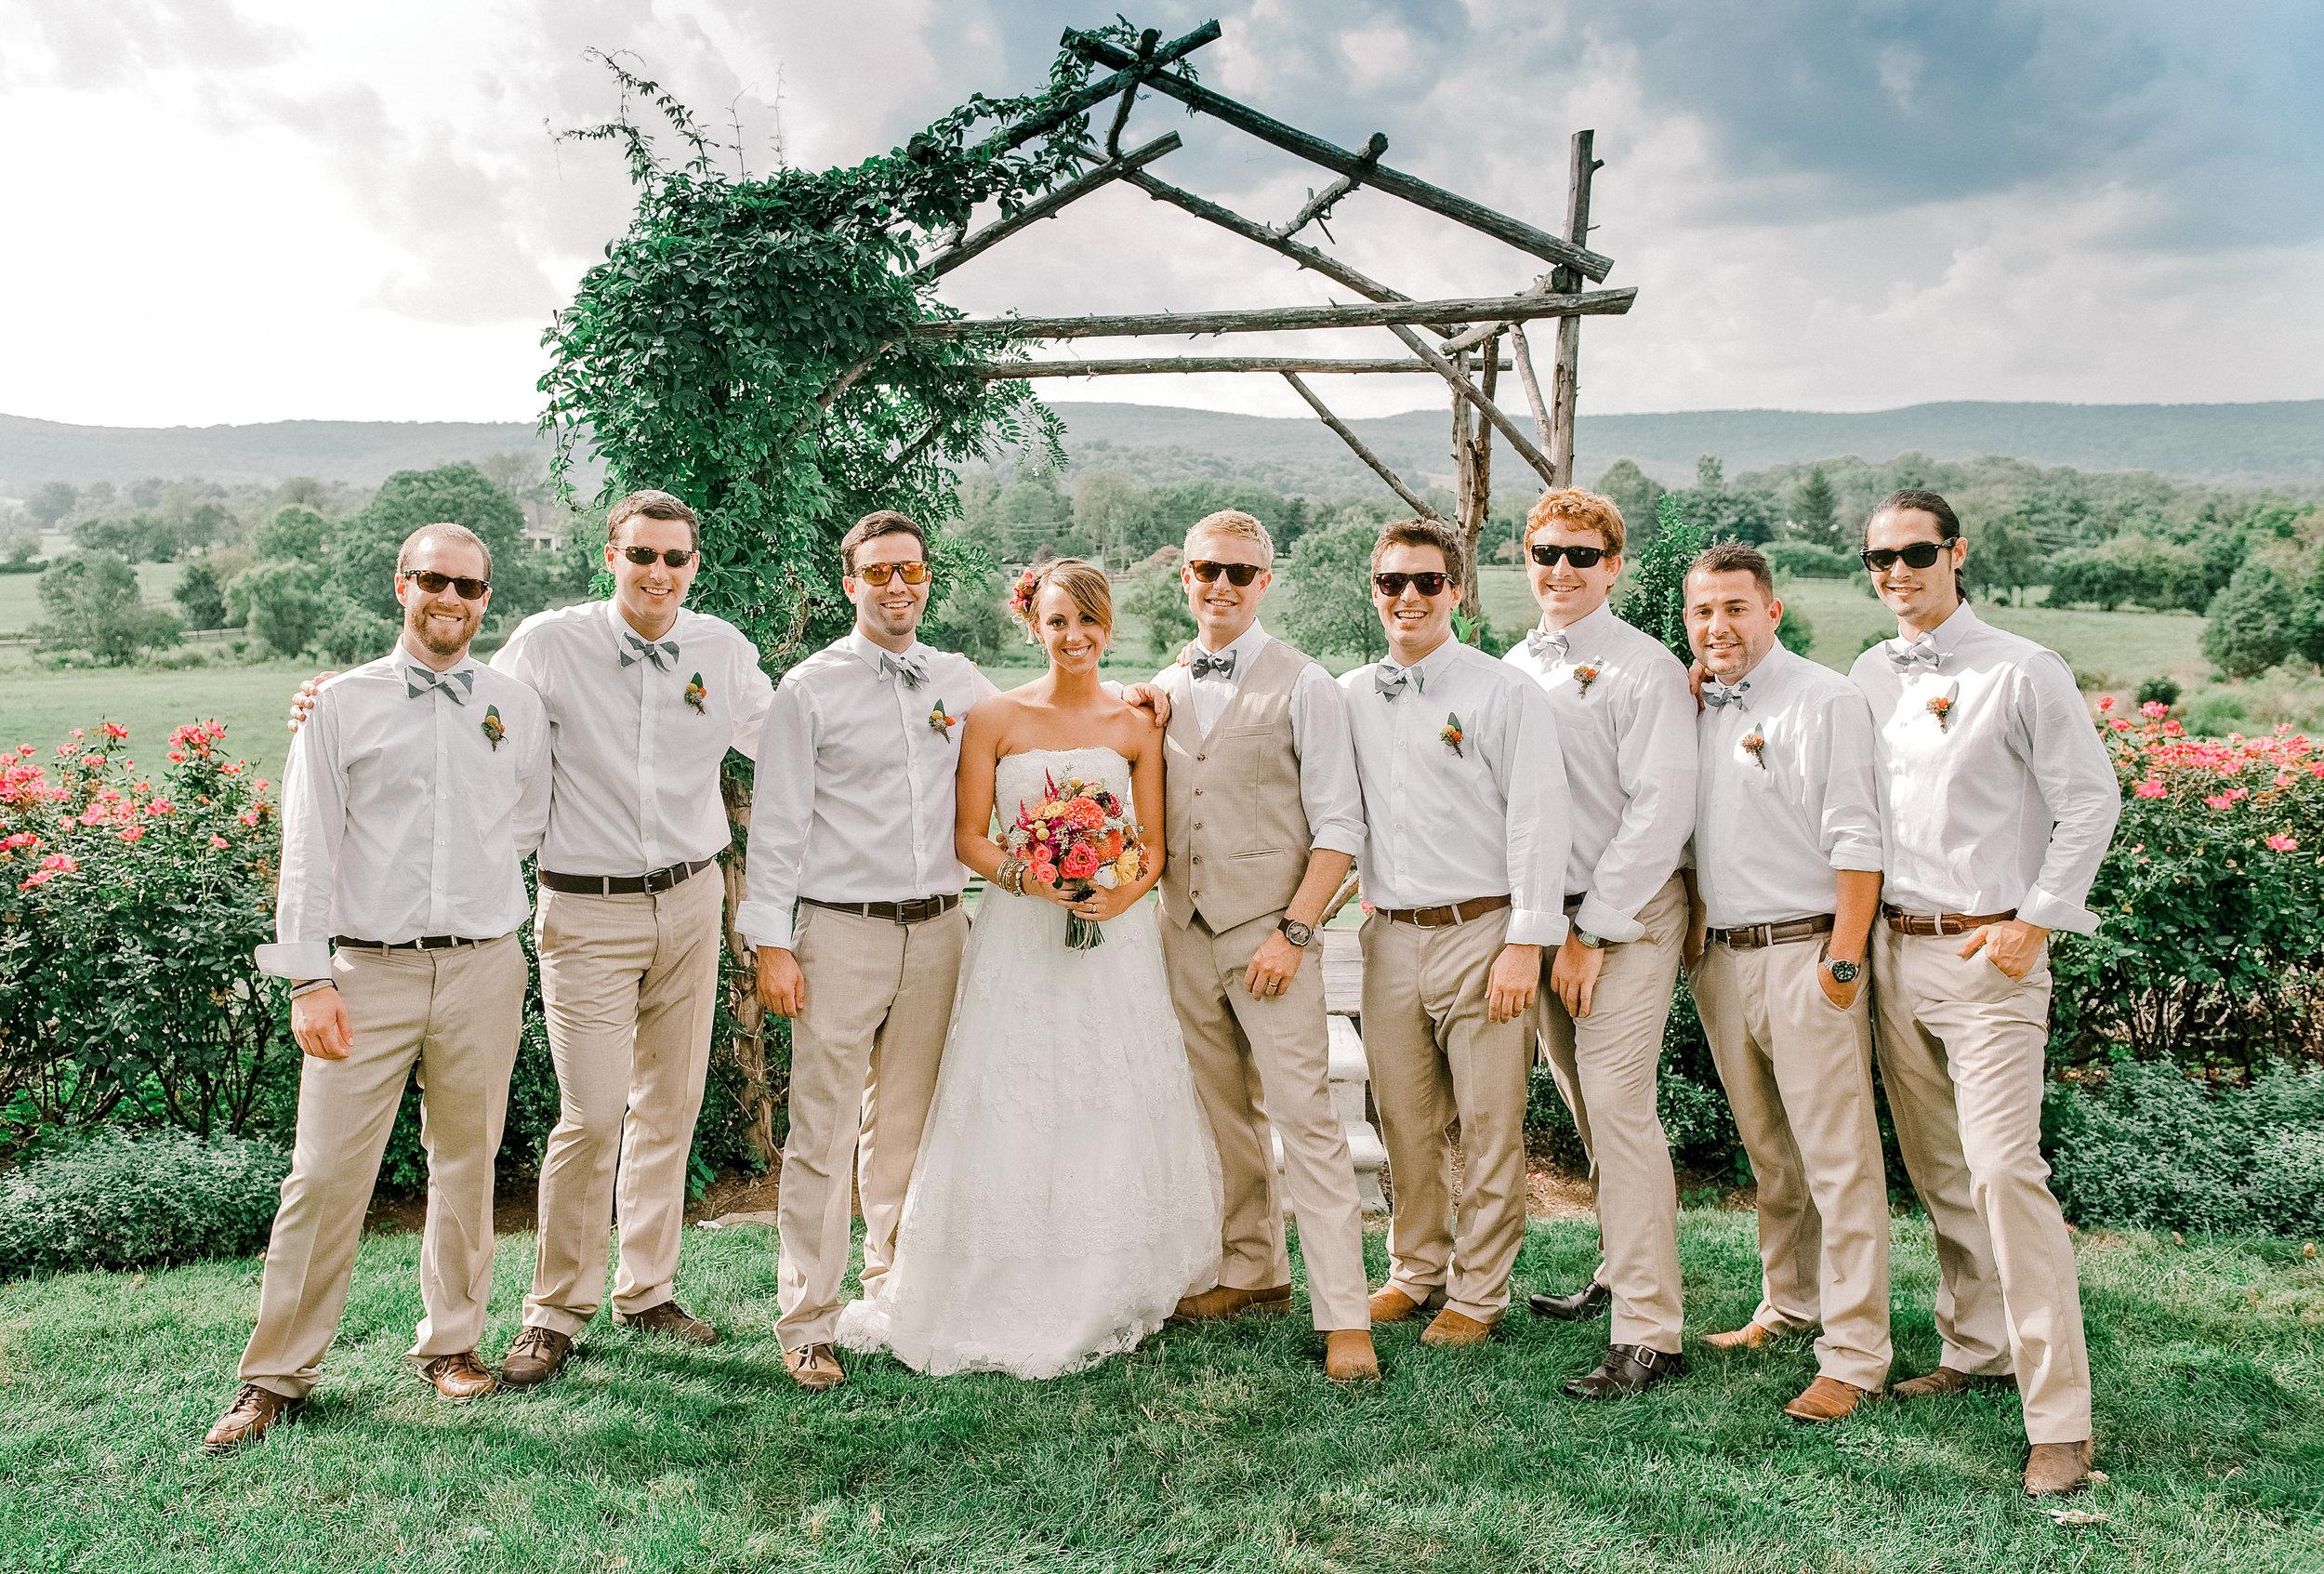 Silverbrook-Farm-Weddings-Virginia-25.jpg